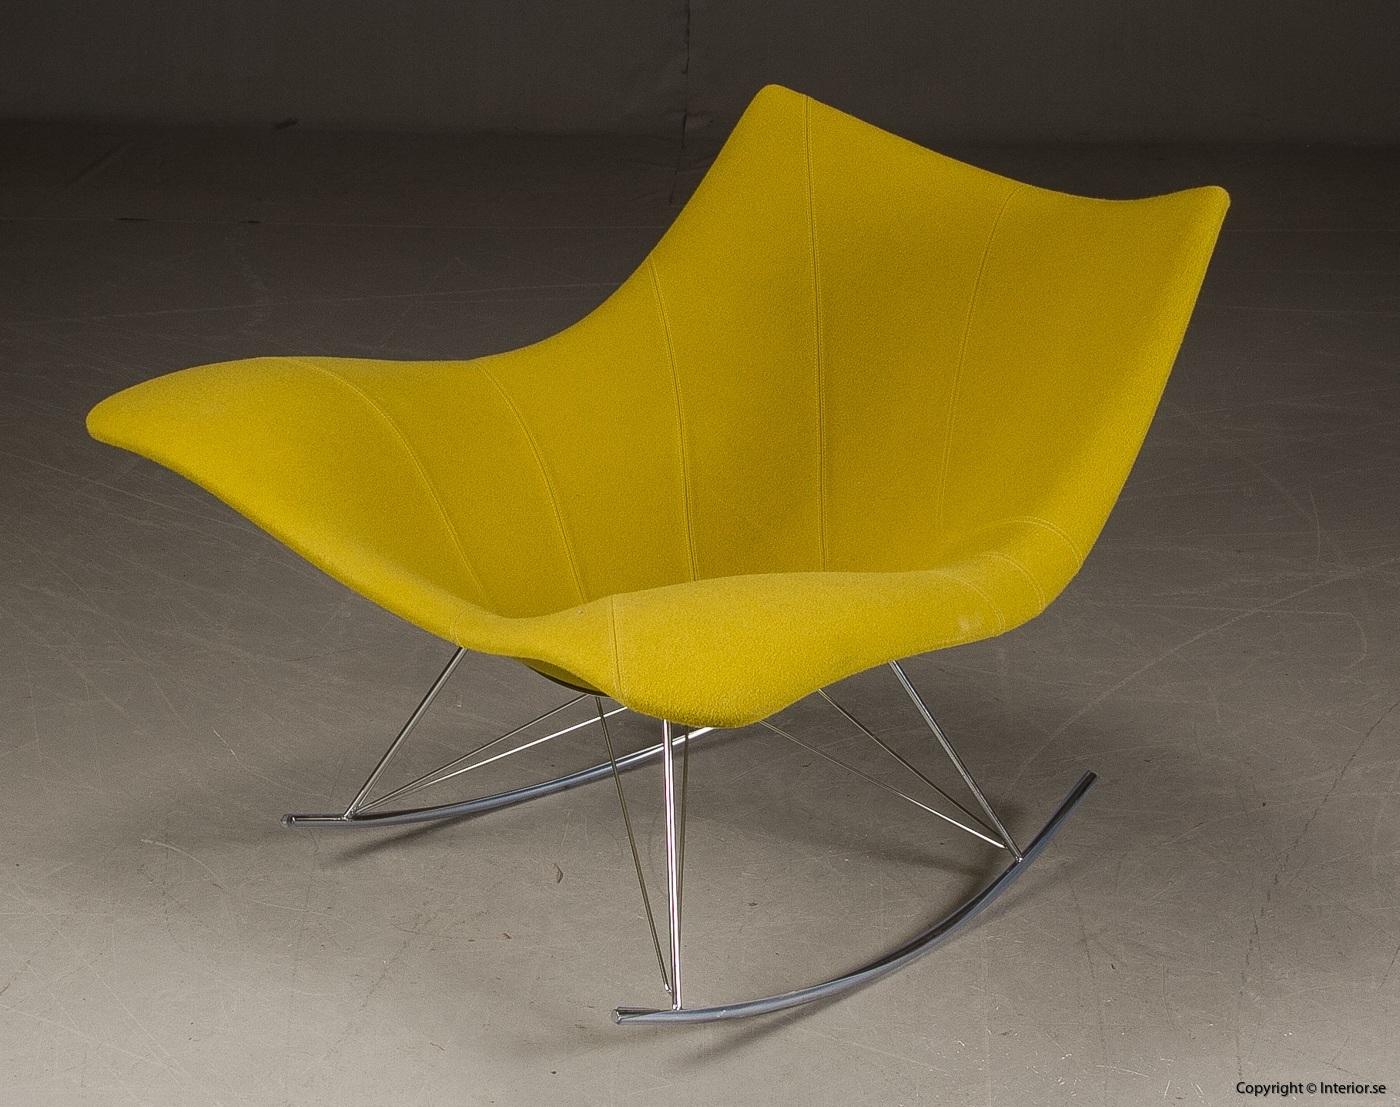 Gungstol fåtölj rocking chair, Fredericia Furniture Stingray - Klädd